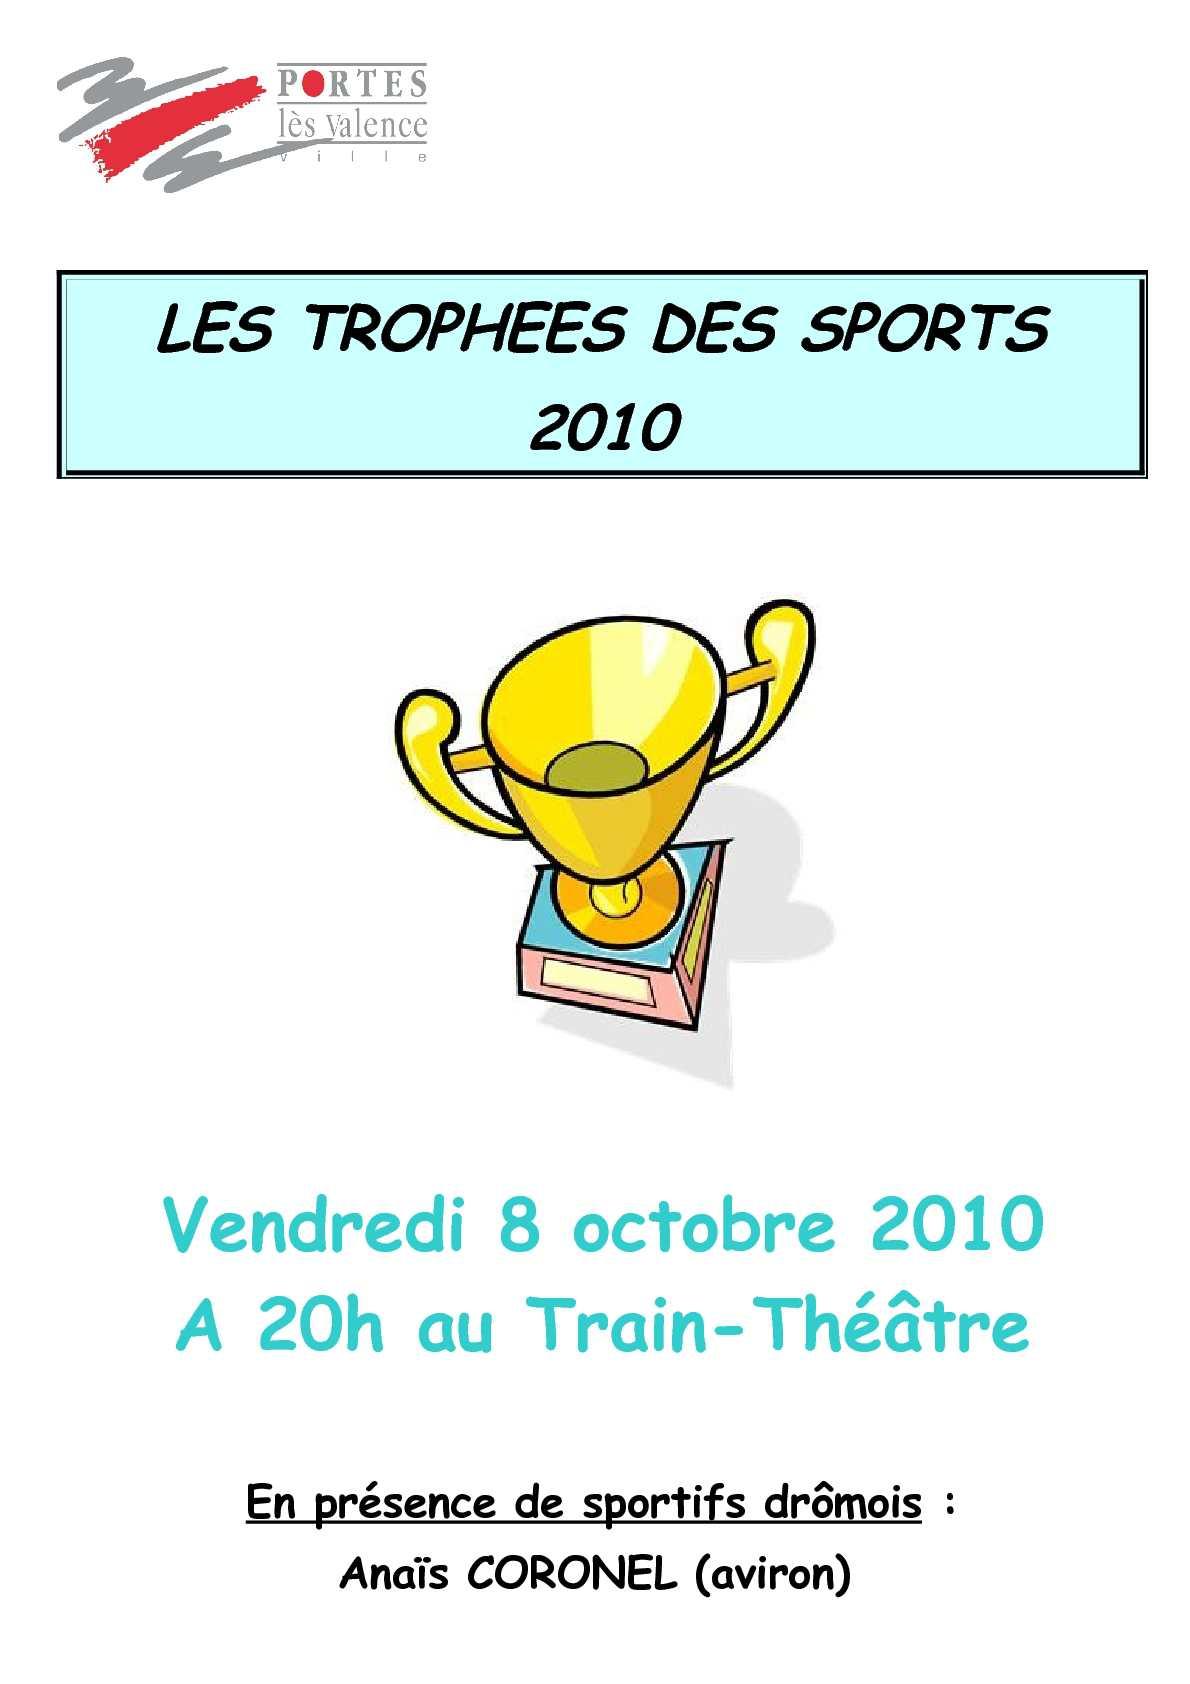 Calam o les trophees des sports 2010 - Programme train theatre portes les valence ...